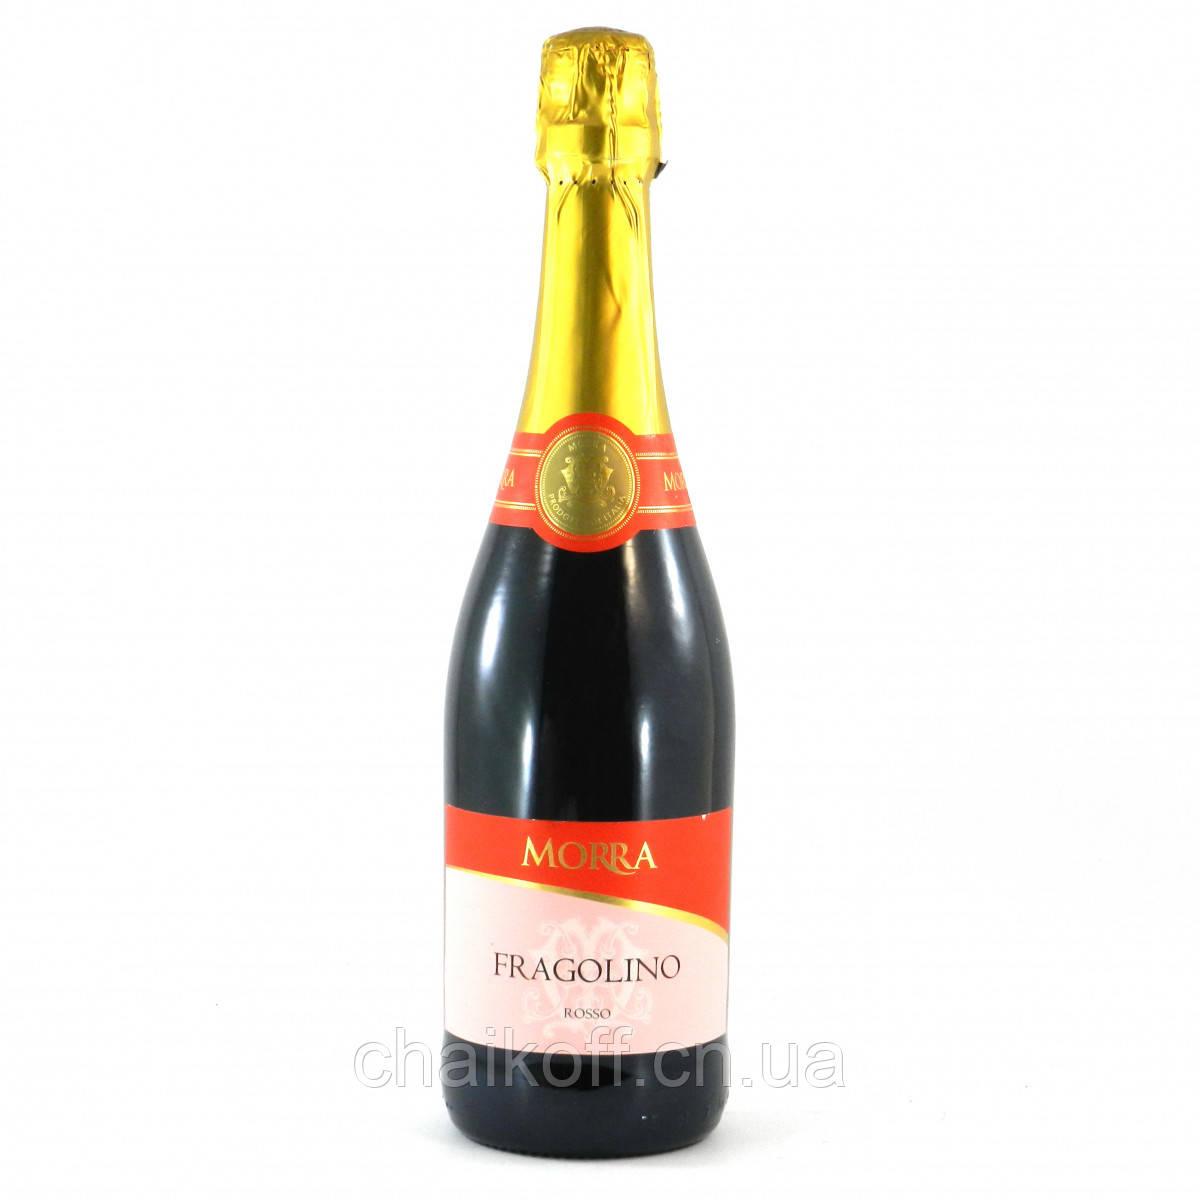 Вино Morra  Fragolino Rosso 0.7l (шт.)